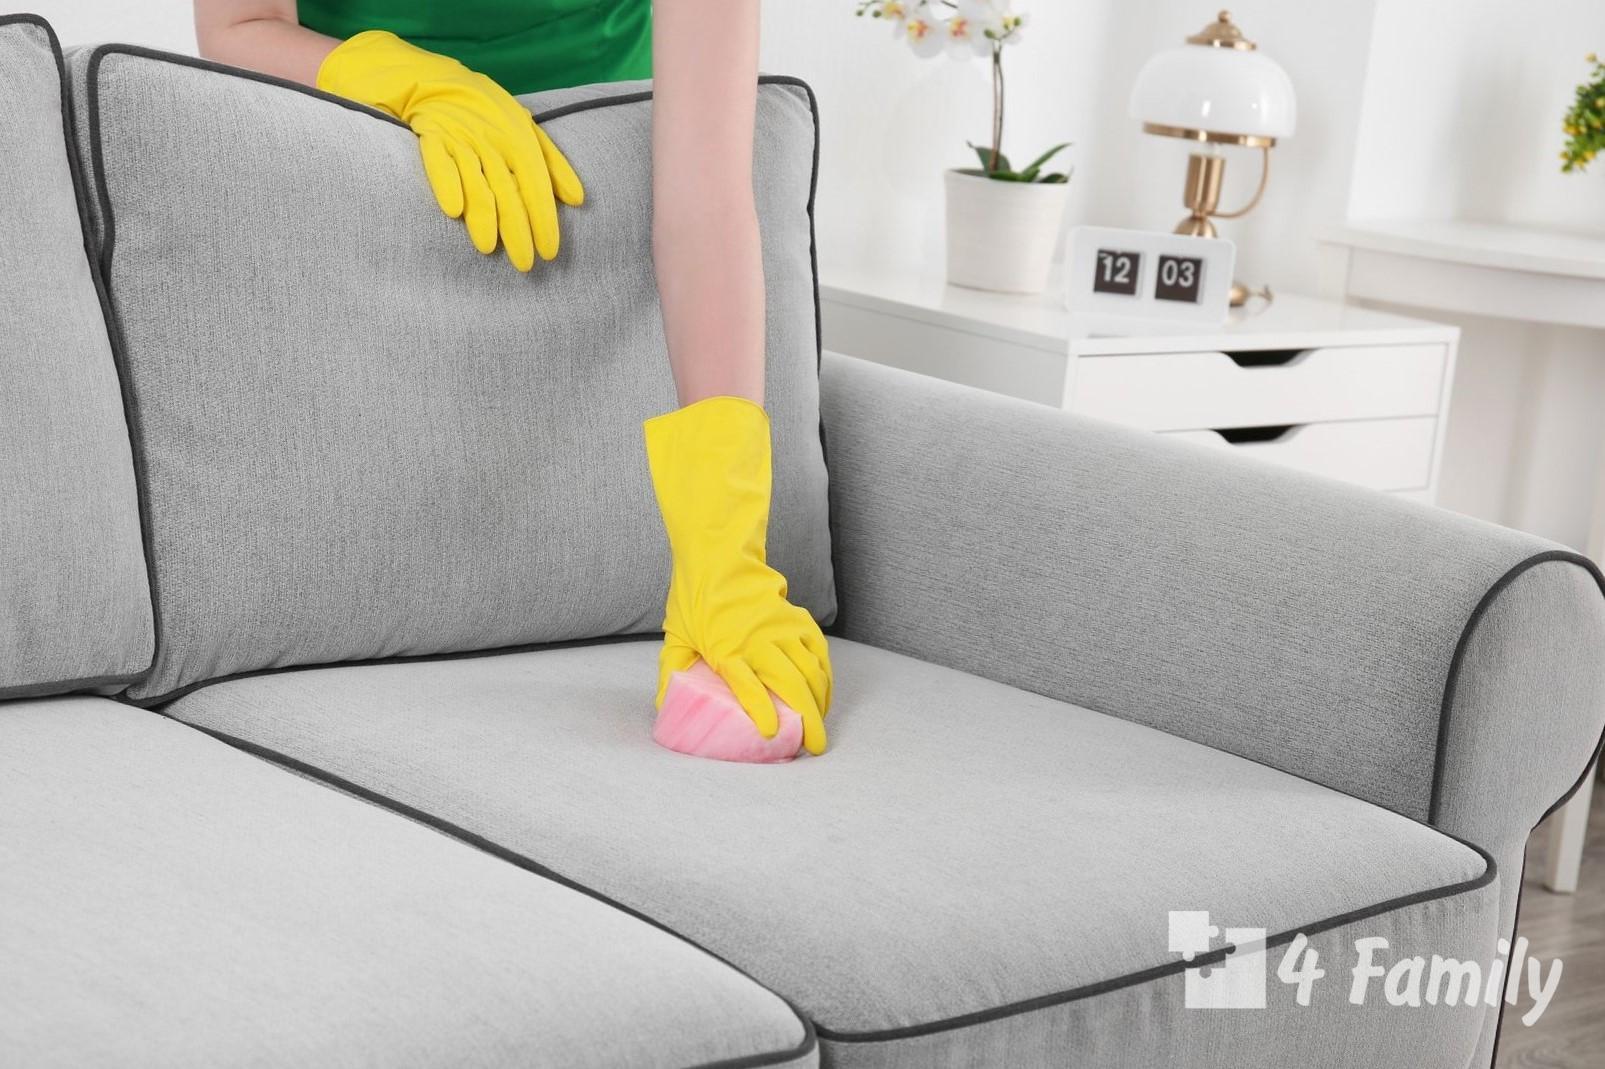 4family Как почистить диван от грязи и запаха в домашних условиях